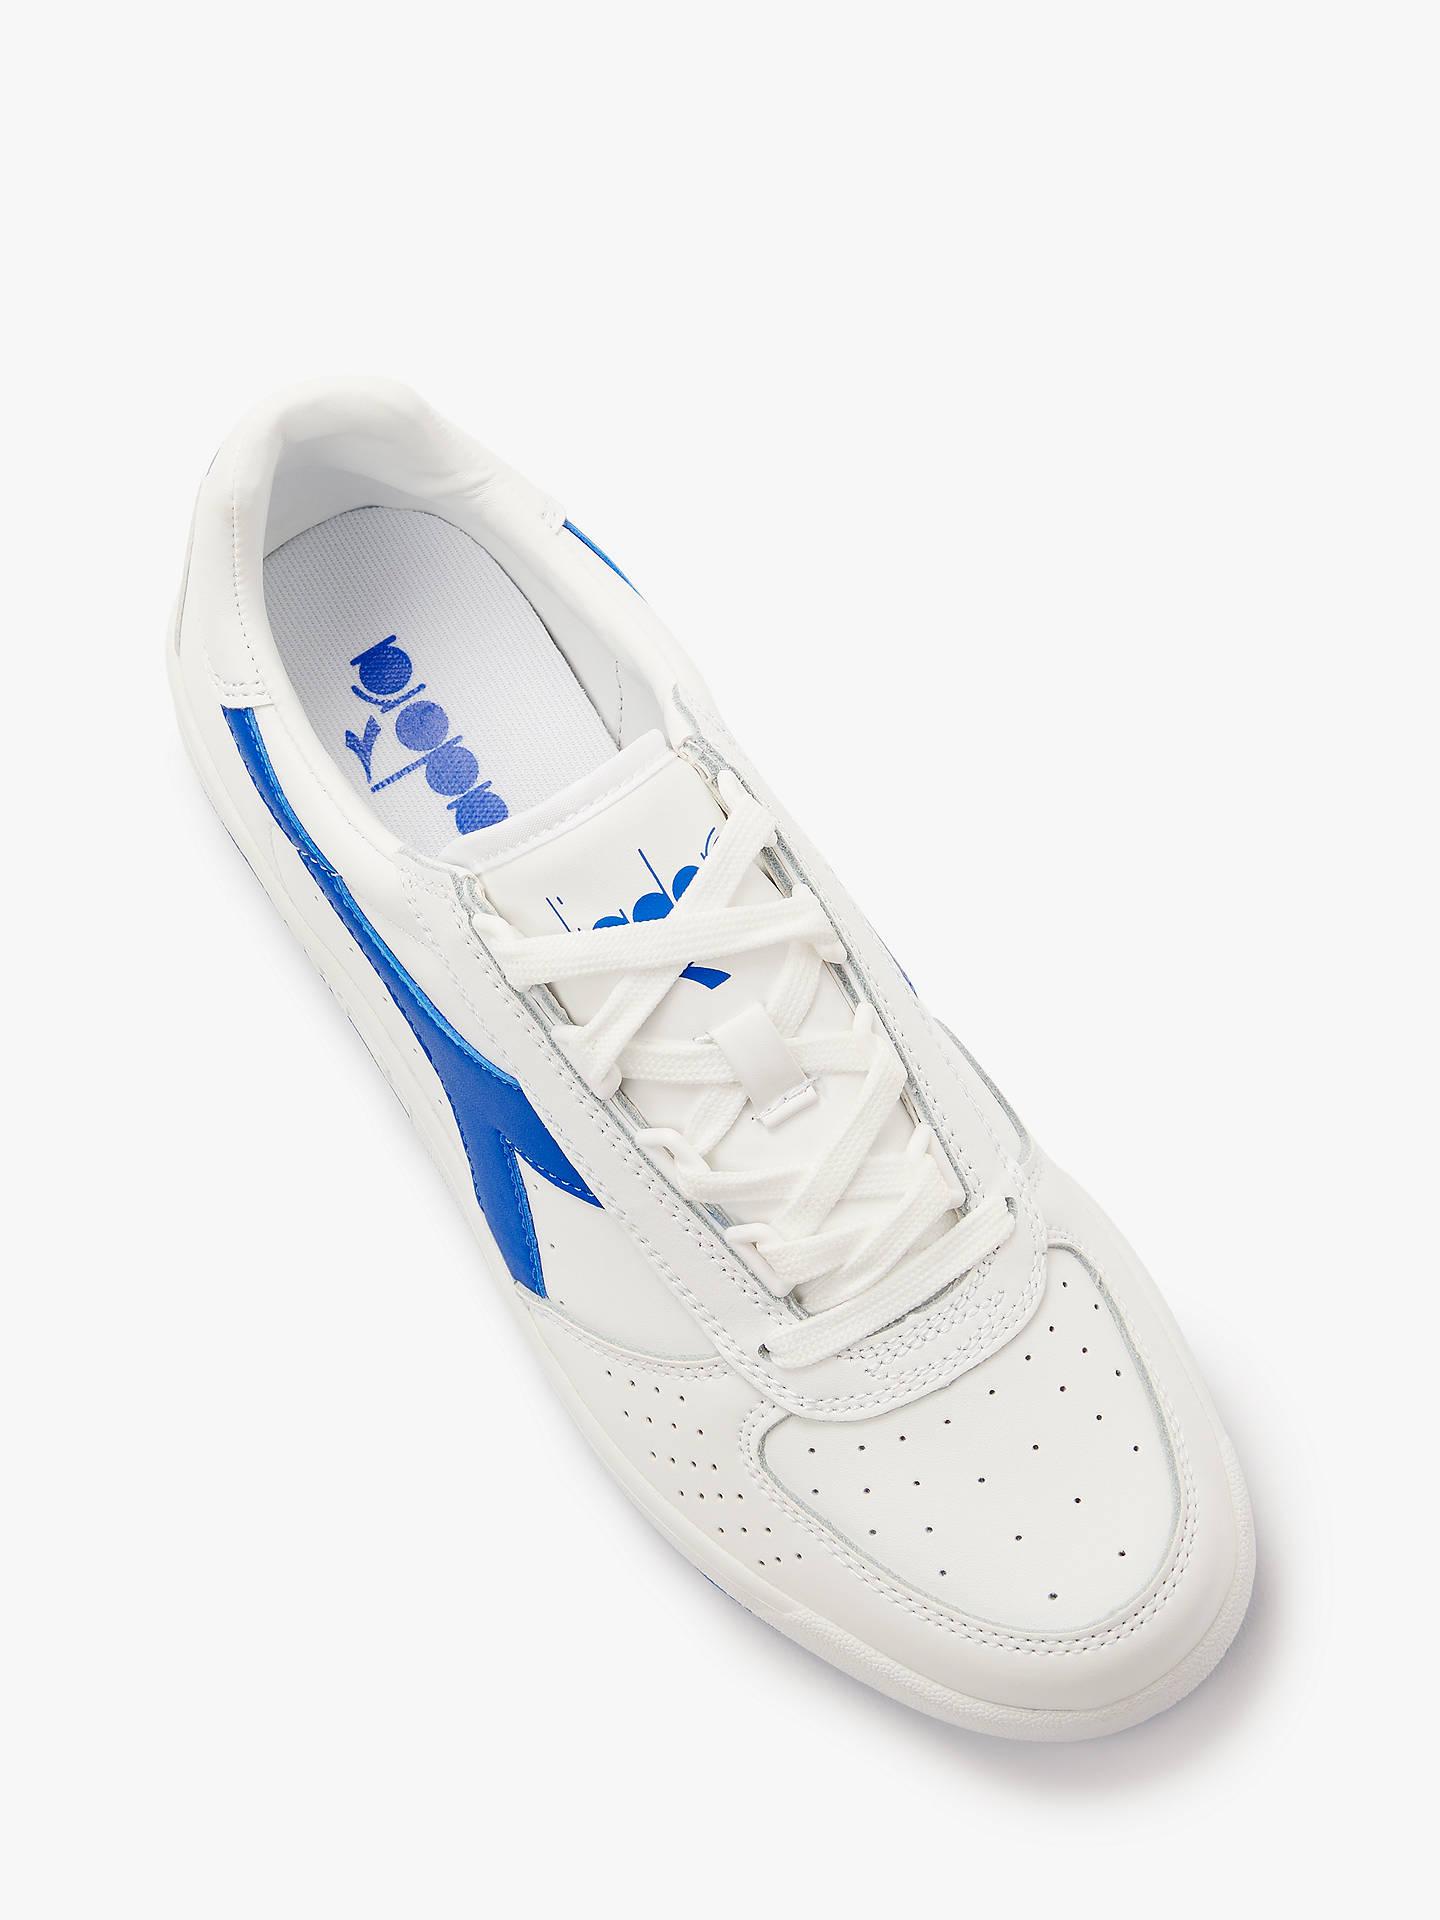 9144a998e1 Diadora B.Elite Lace Up Trainers, White/Royal Blue at John Lewis ...